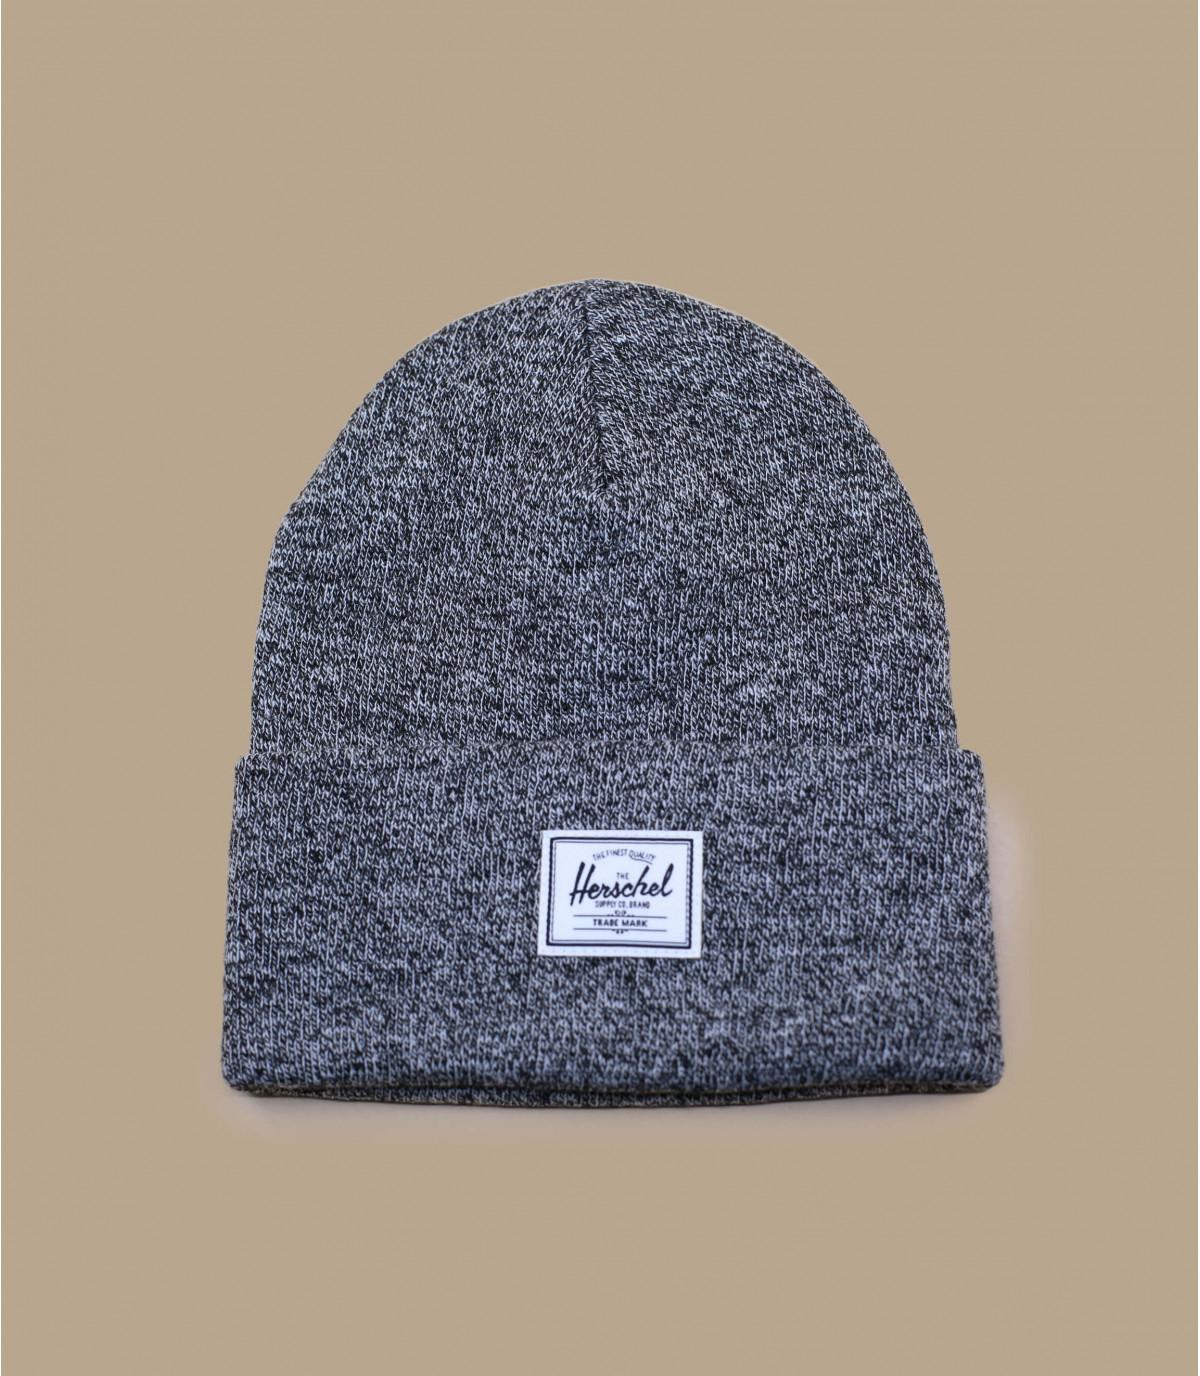 Herschel moteado negro gorra